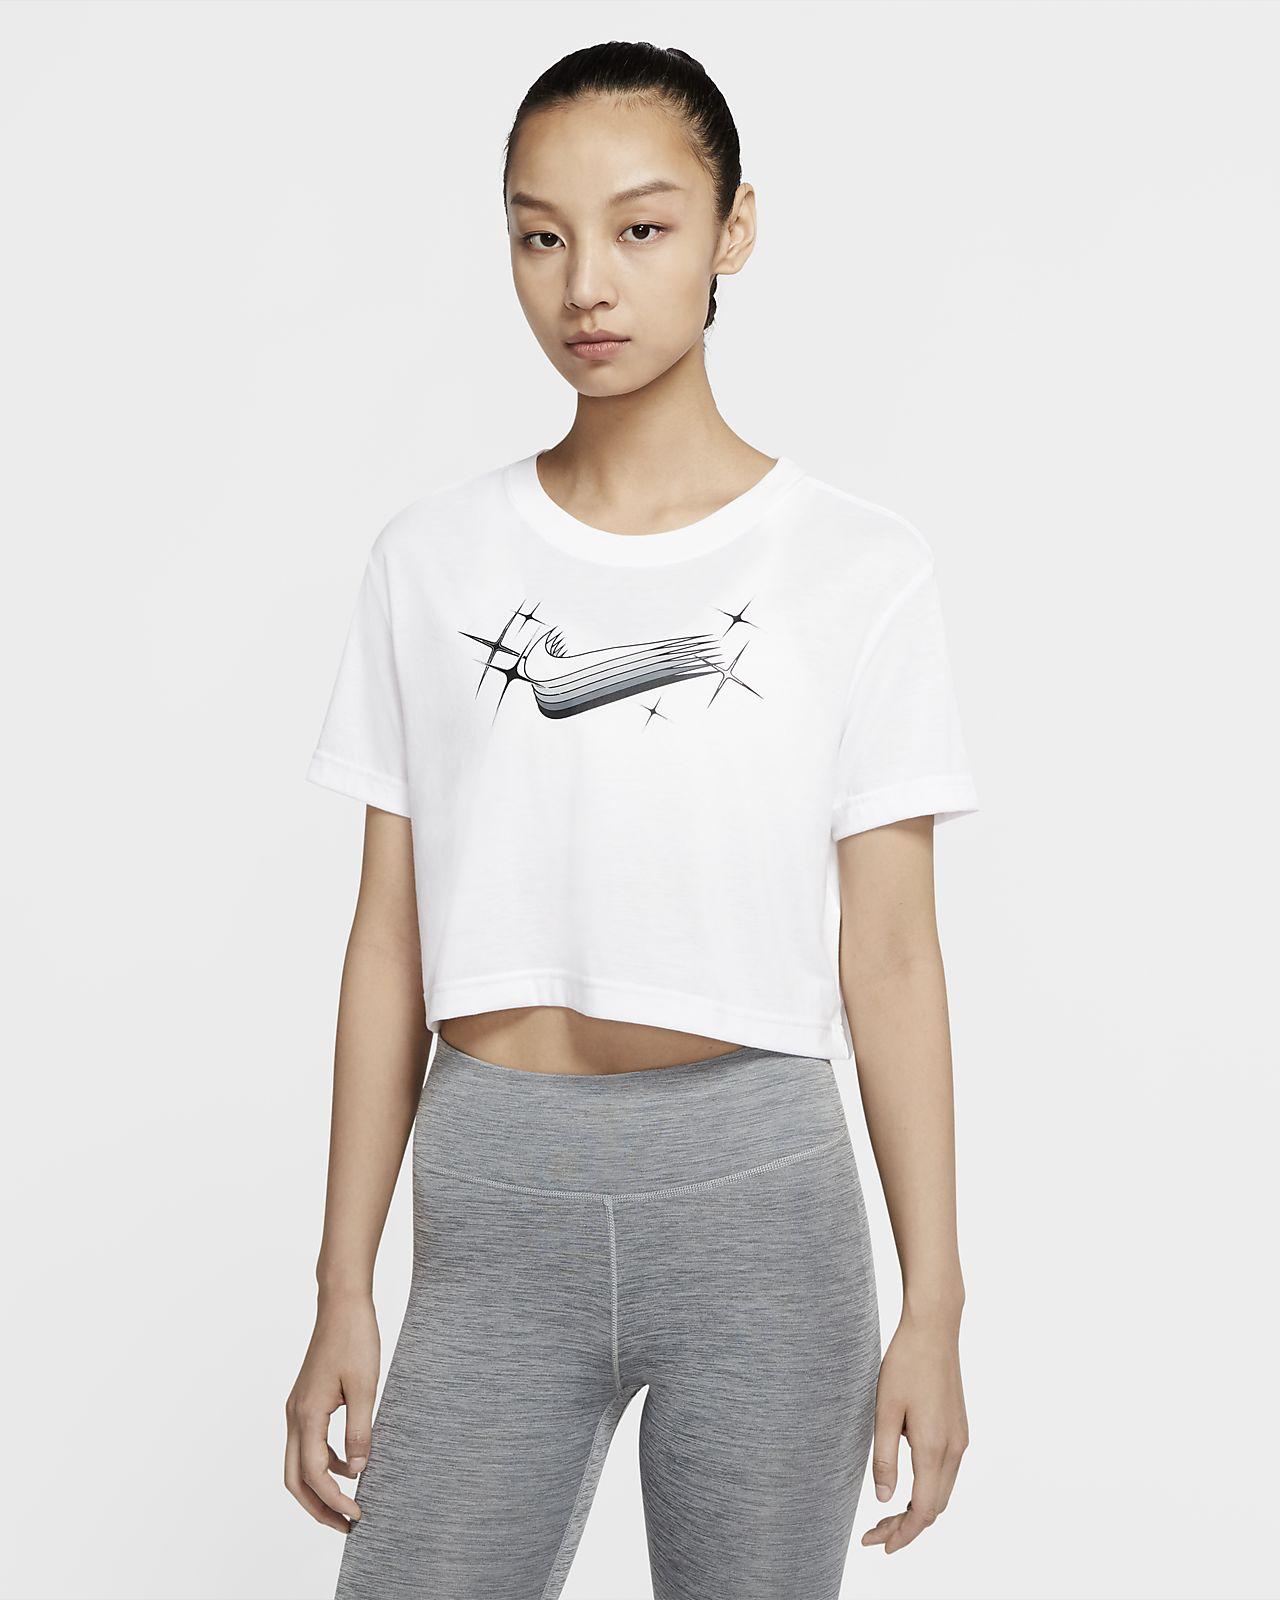 Nike Dri-FIT 女子短款训练T恤